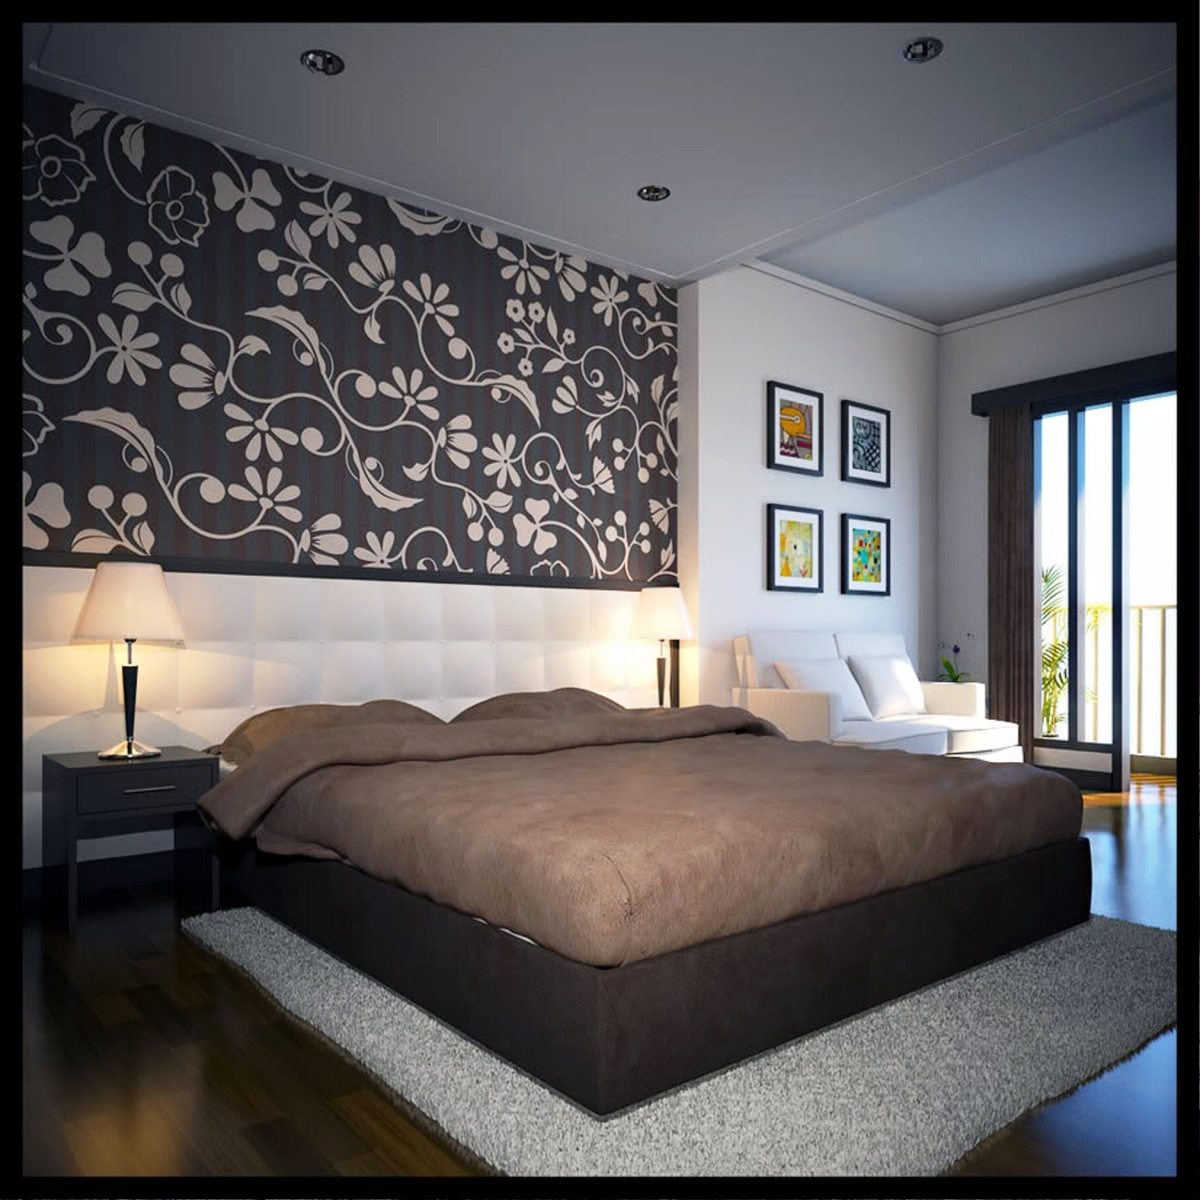 Bedroom ensuite designs